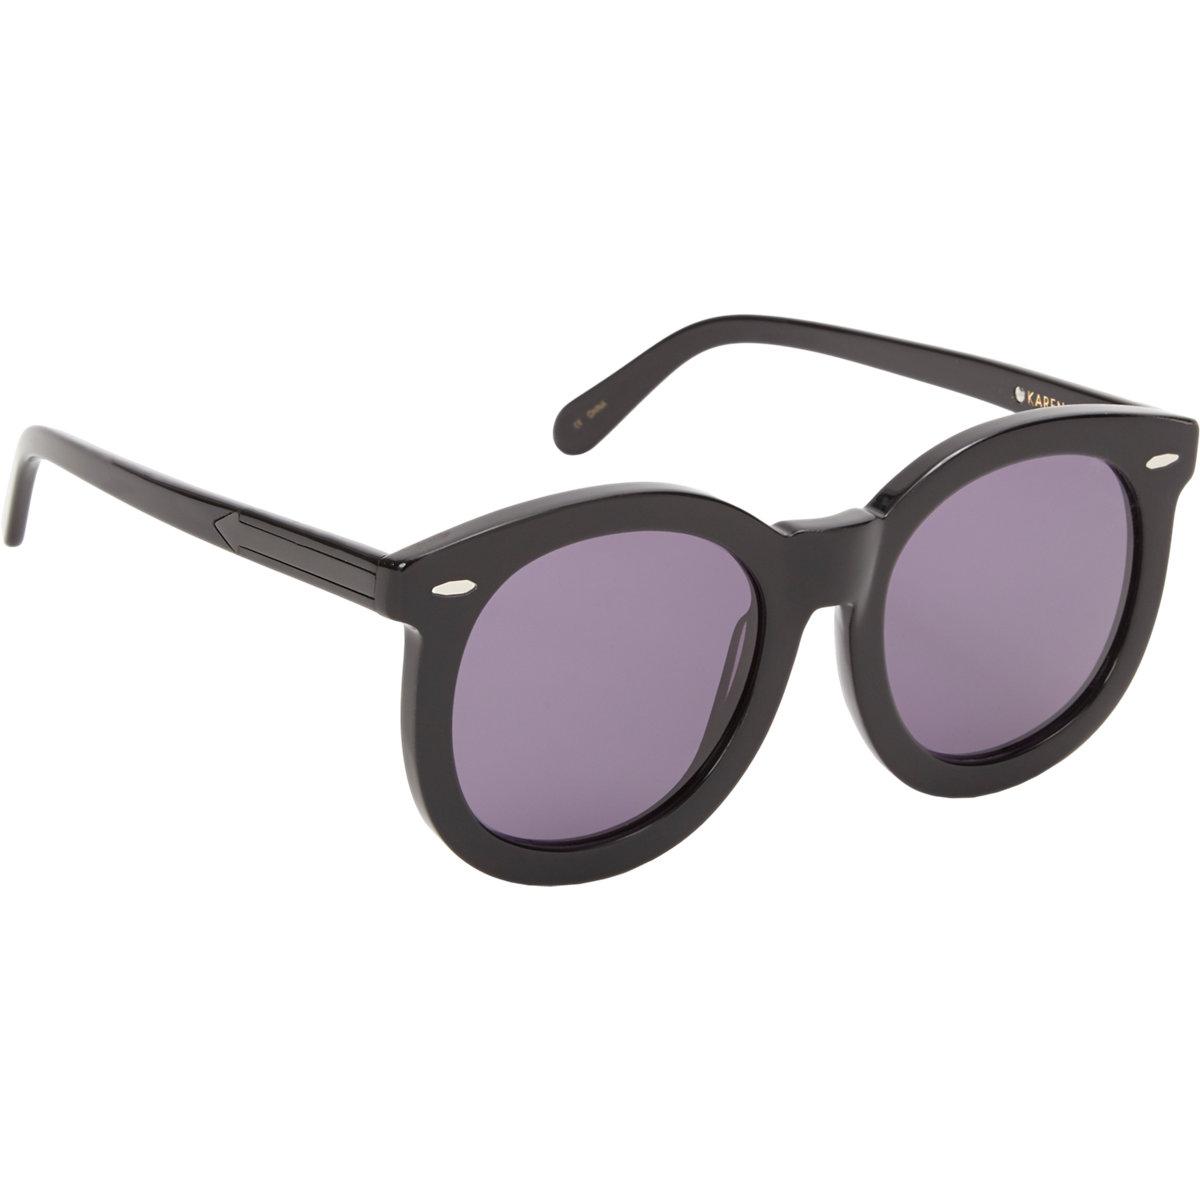 Karen walker super worship sunglasses at barneys.com